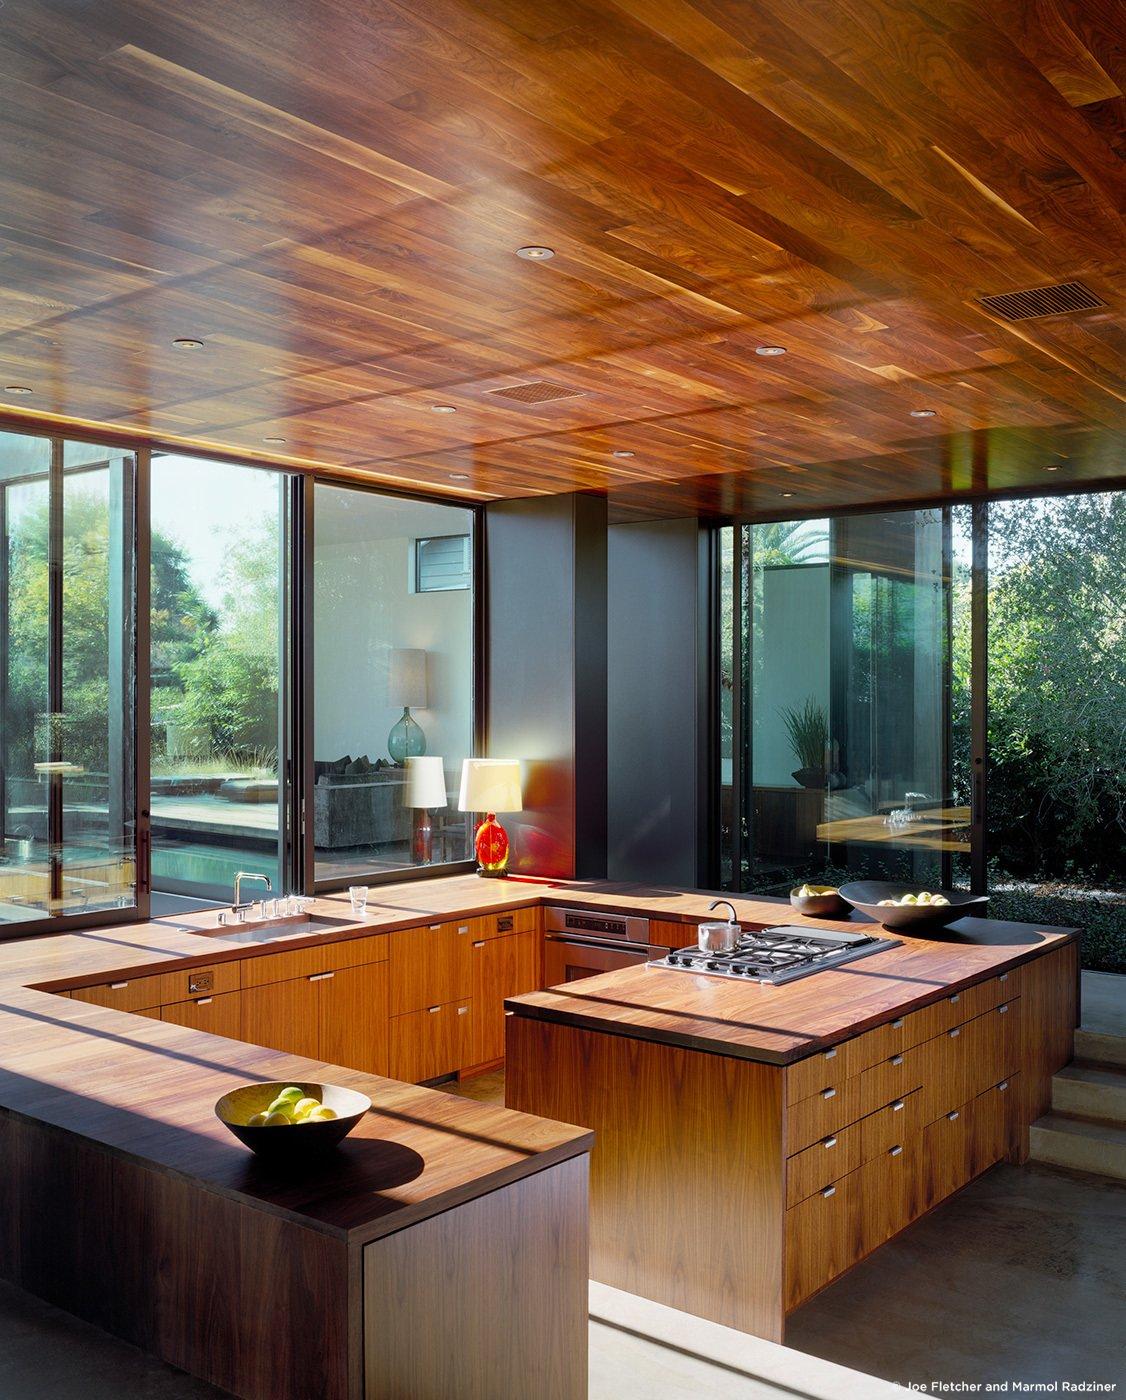 #ViennaWayResidence #modern #midcentury #inside #interior #windows #lighting #dining #wood #table #seating #kitchen #storage #naturallight #Venice #California #MarmolRadziner  Vienna Way Residence by Marmol Radziner